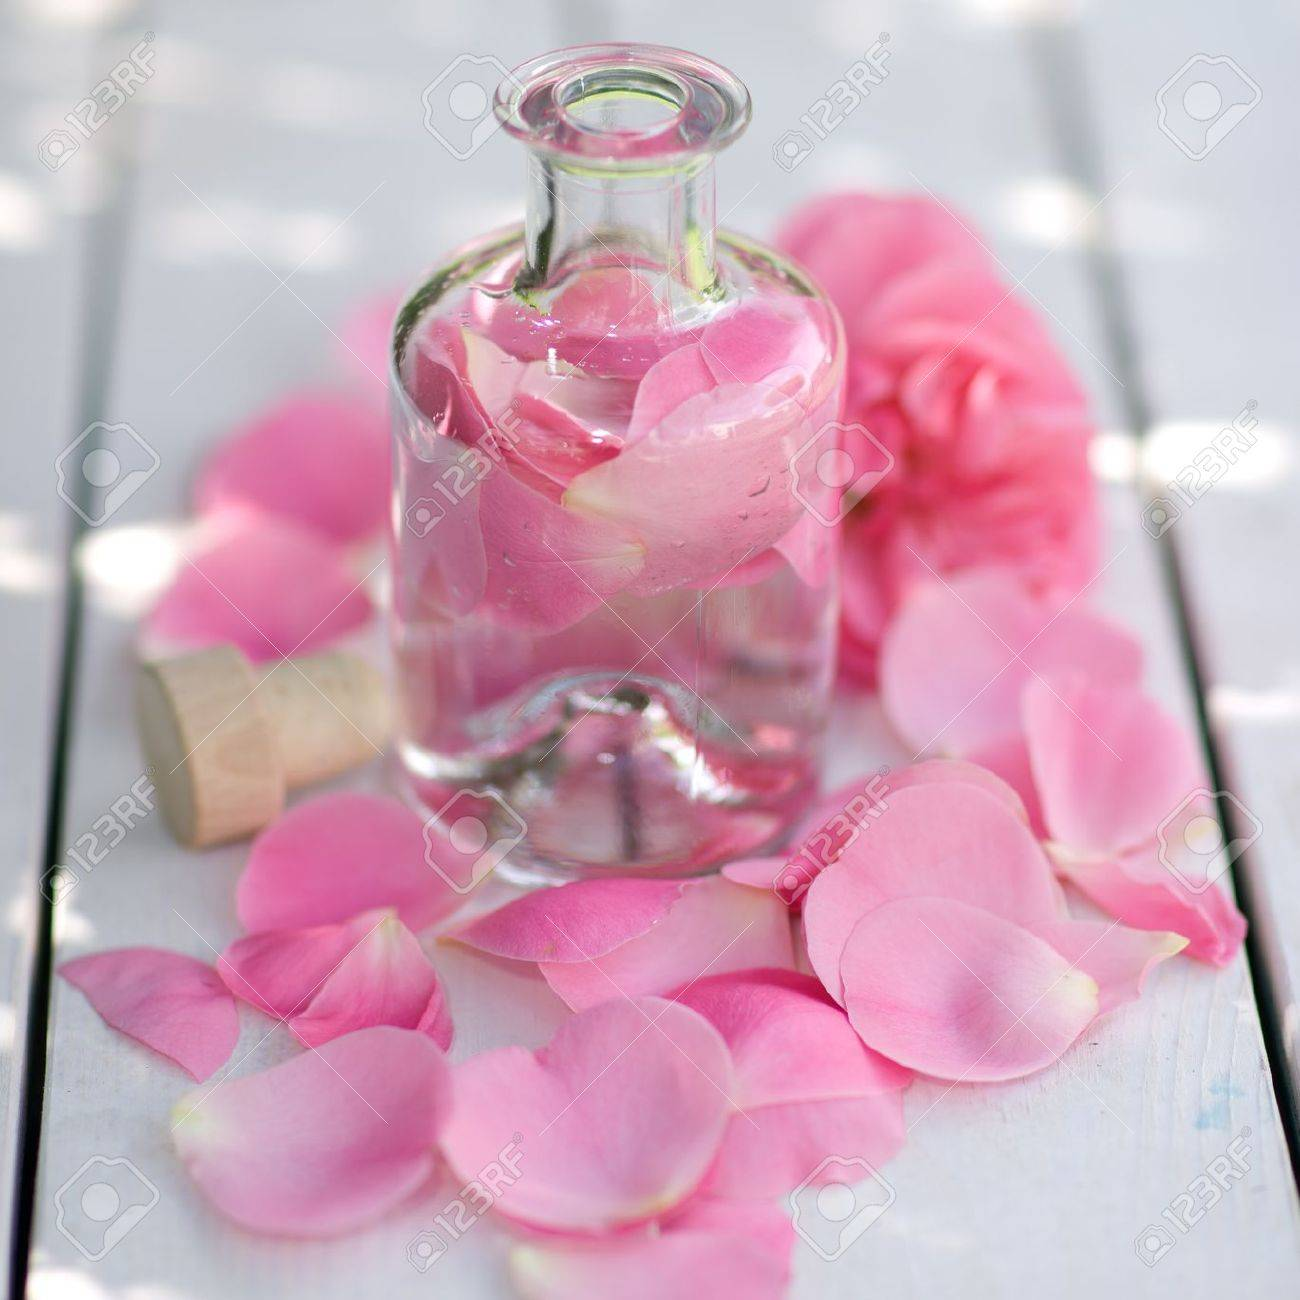 Rose oil Stock Photo - 14929930